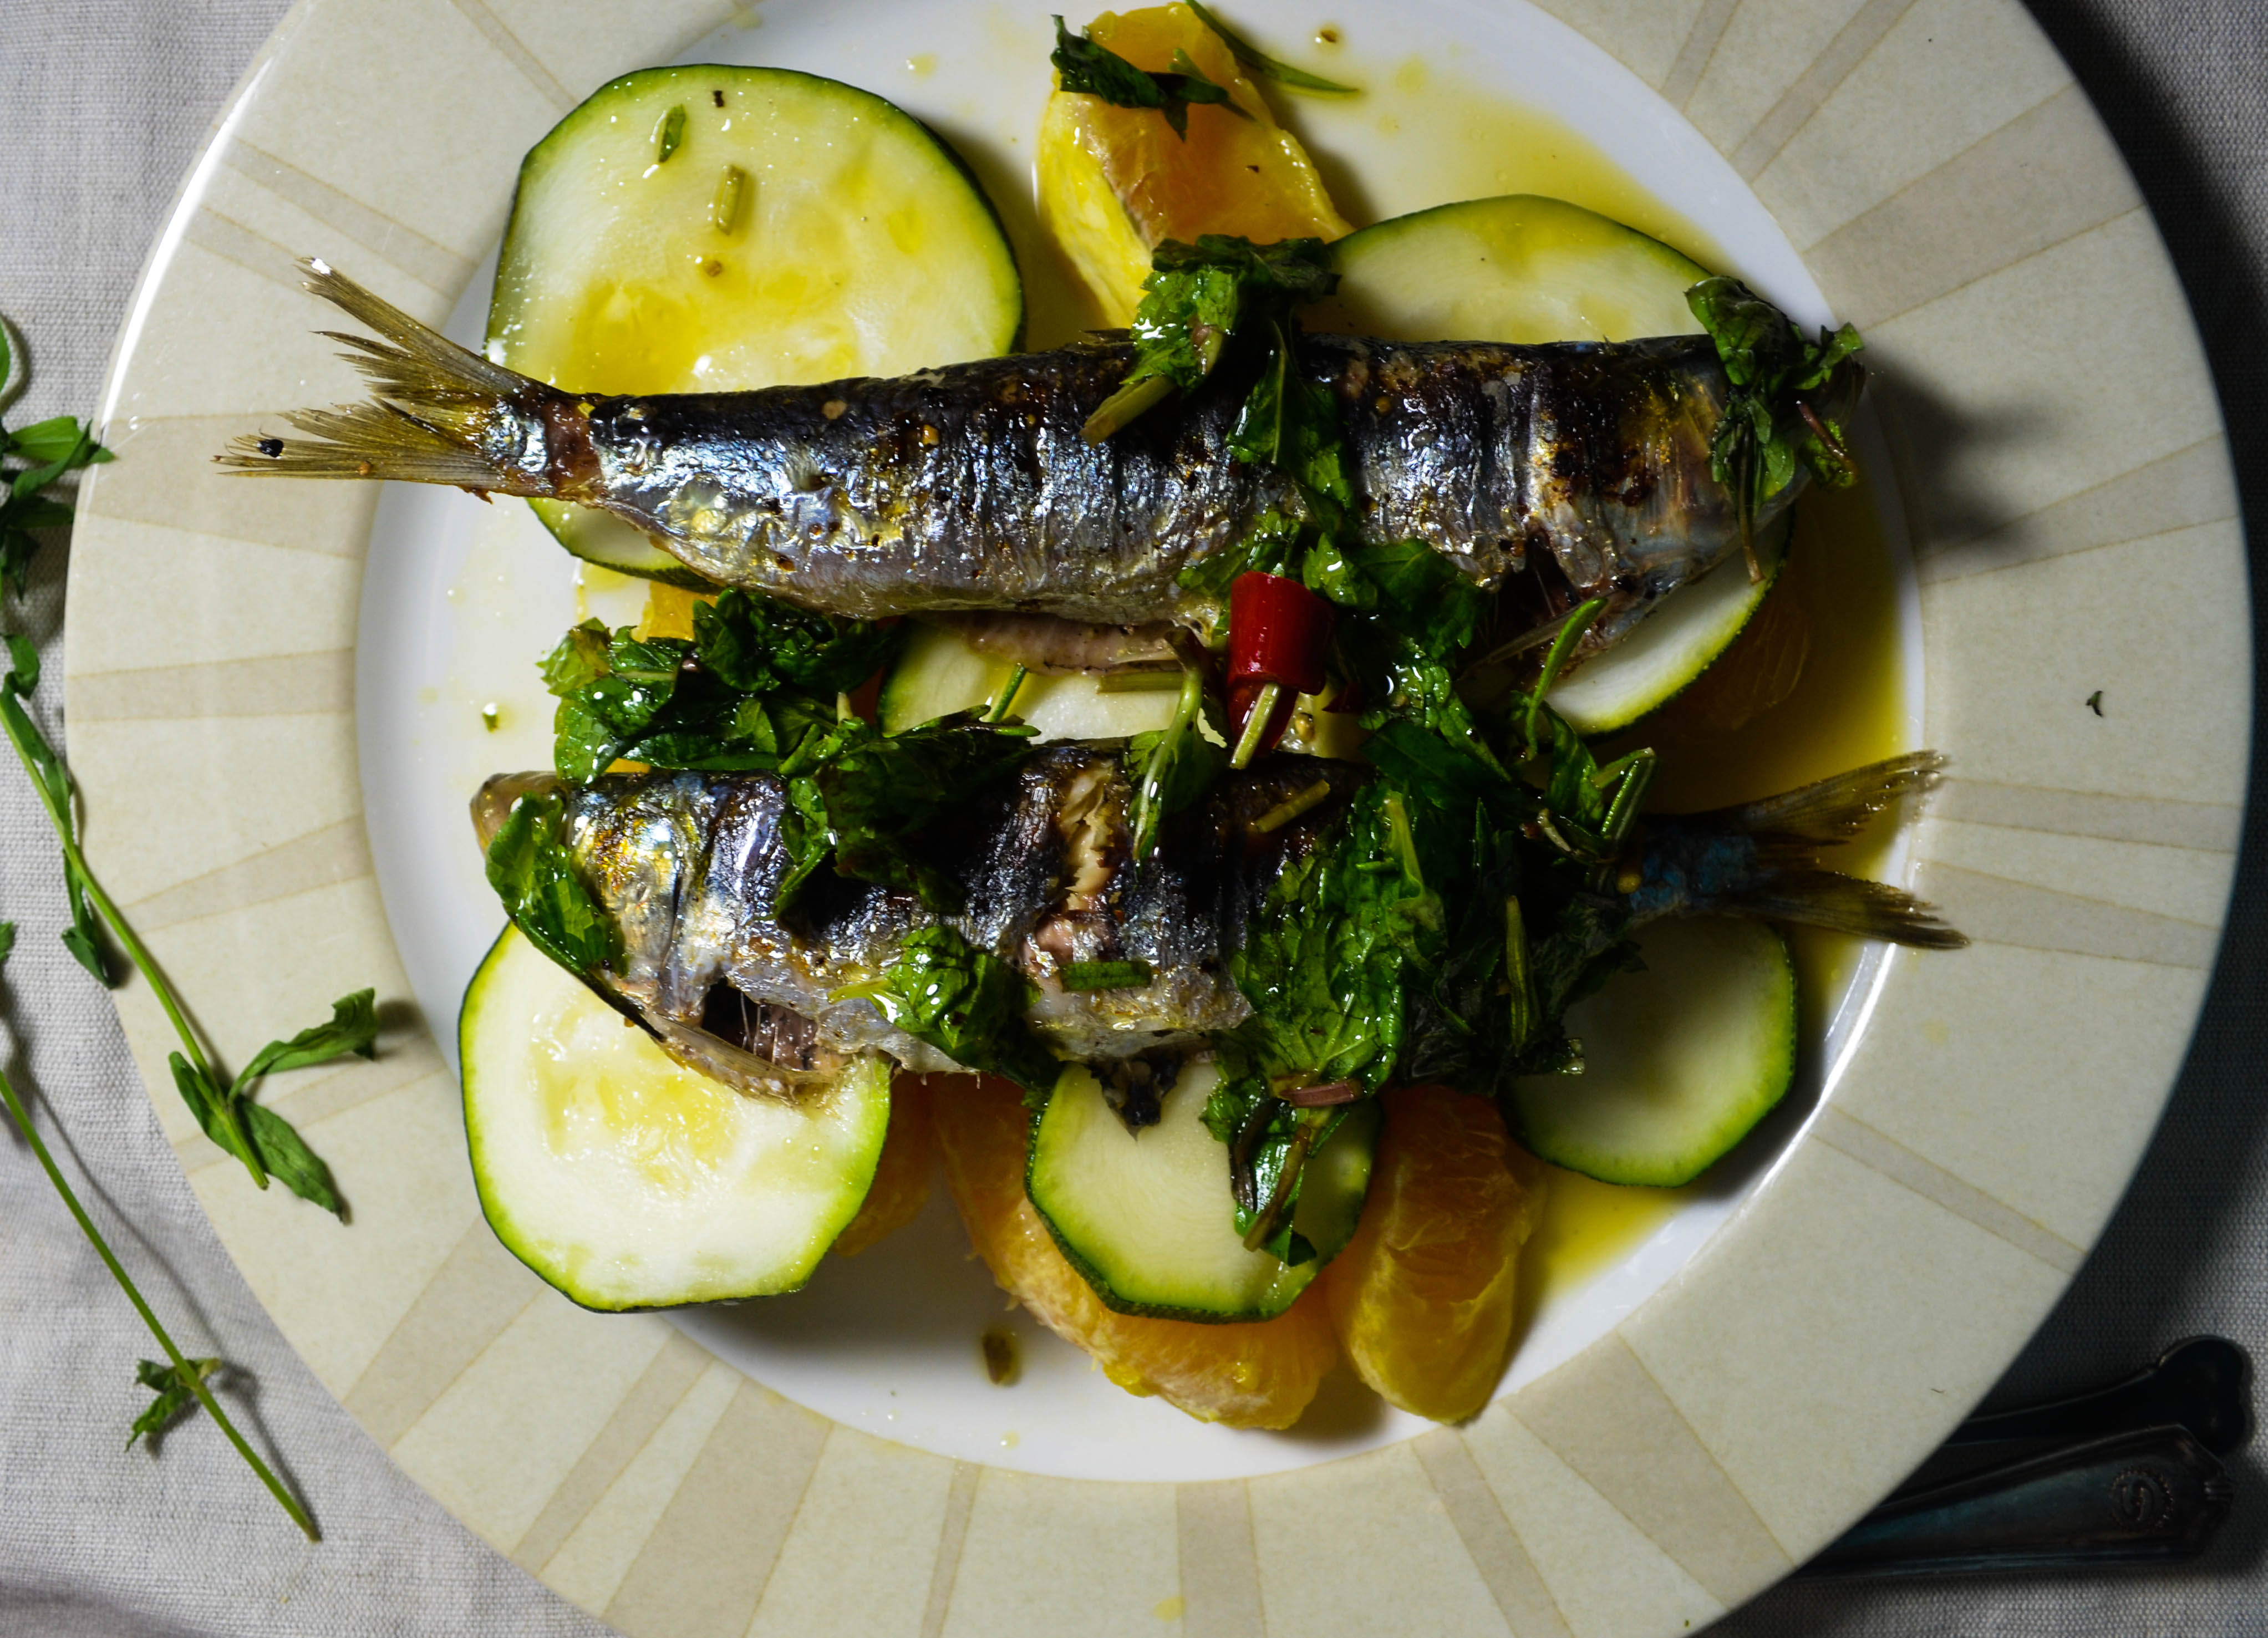 Grilled Sardines Amp Zucchini W Citrus Herbs Amp Chilis